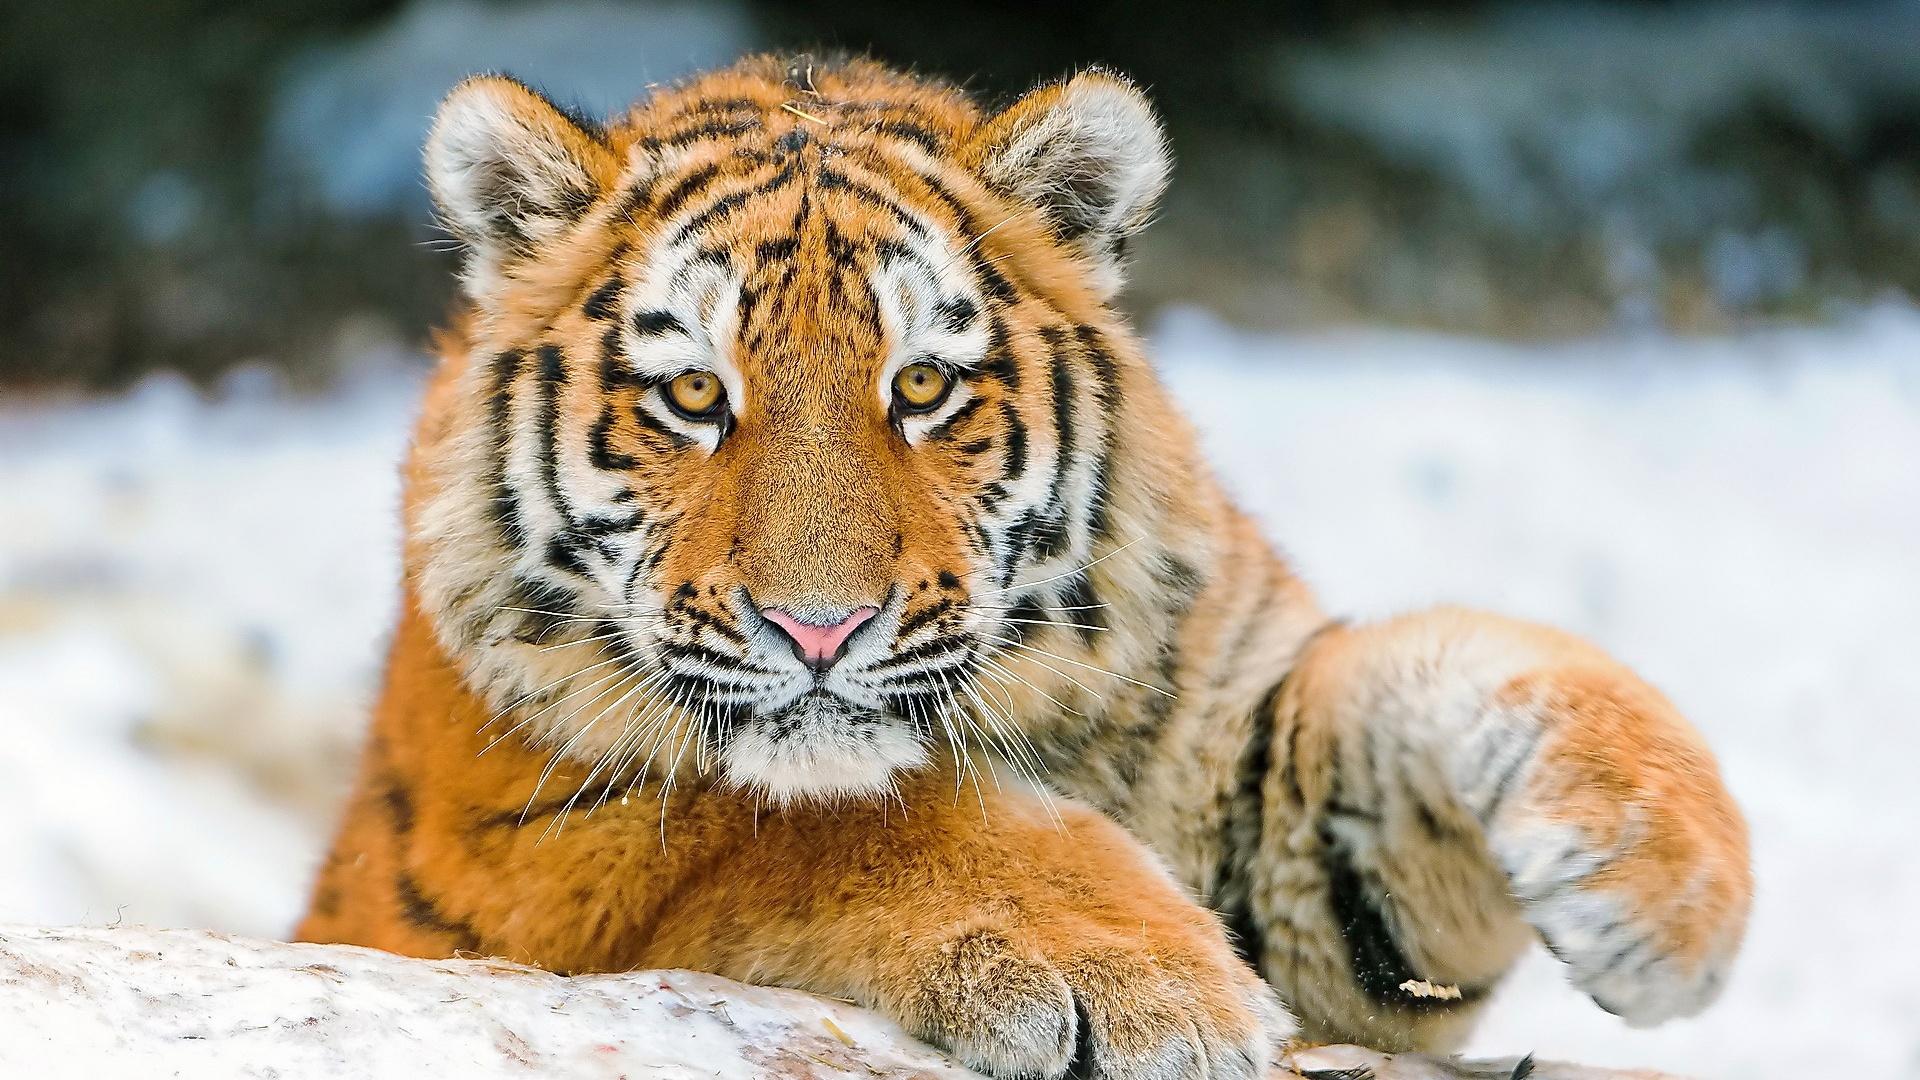 Tiger-Gesichts-Wallpaper